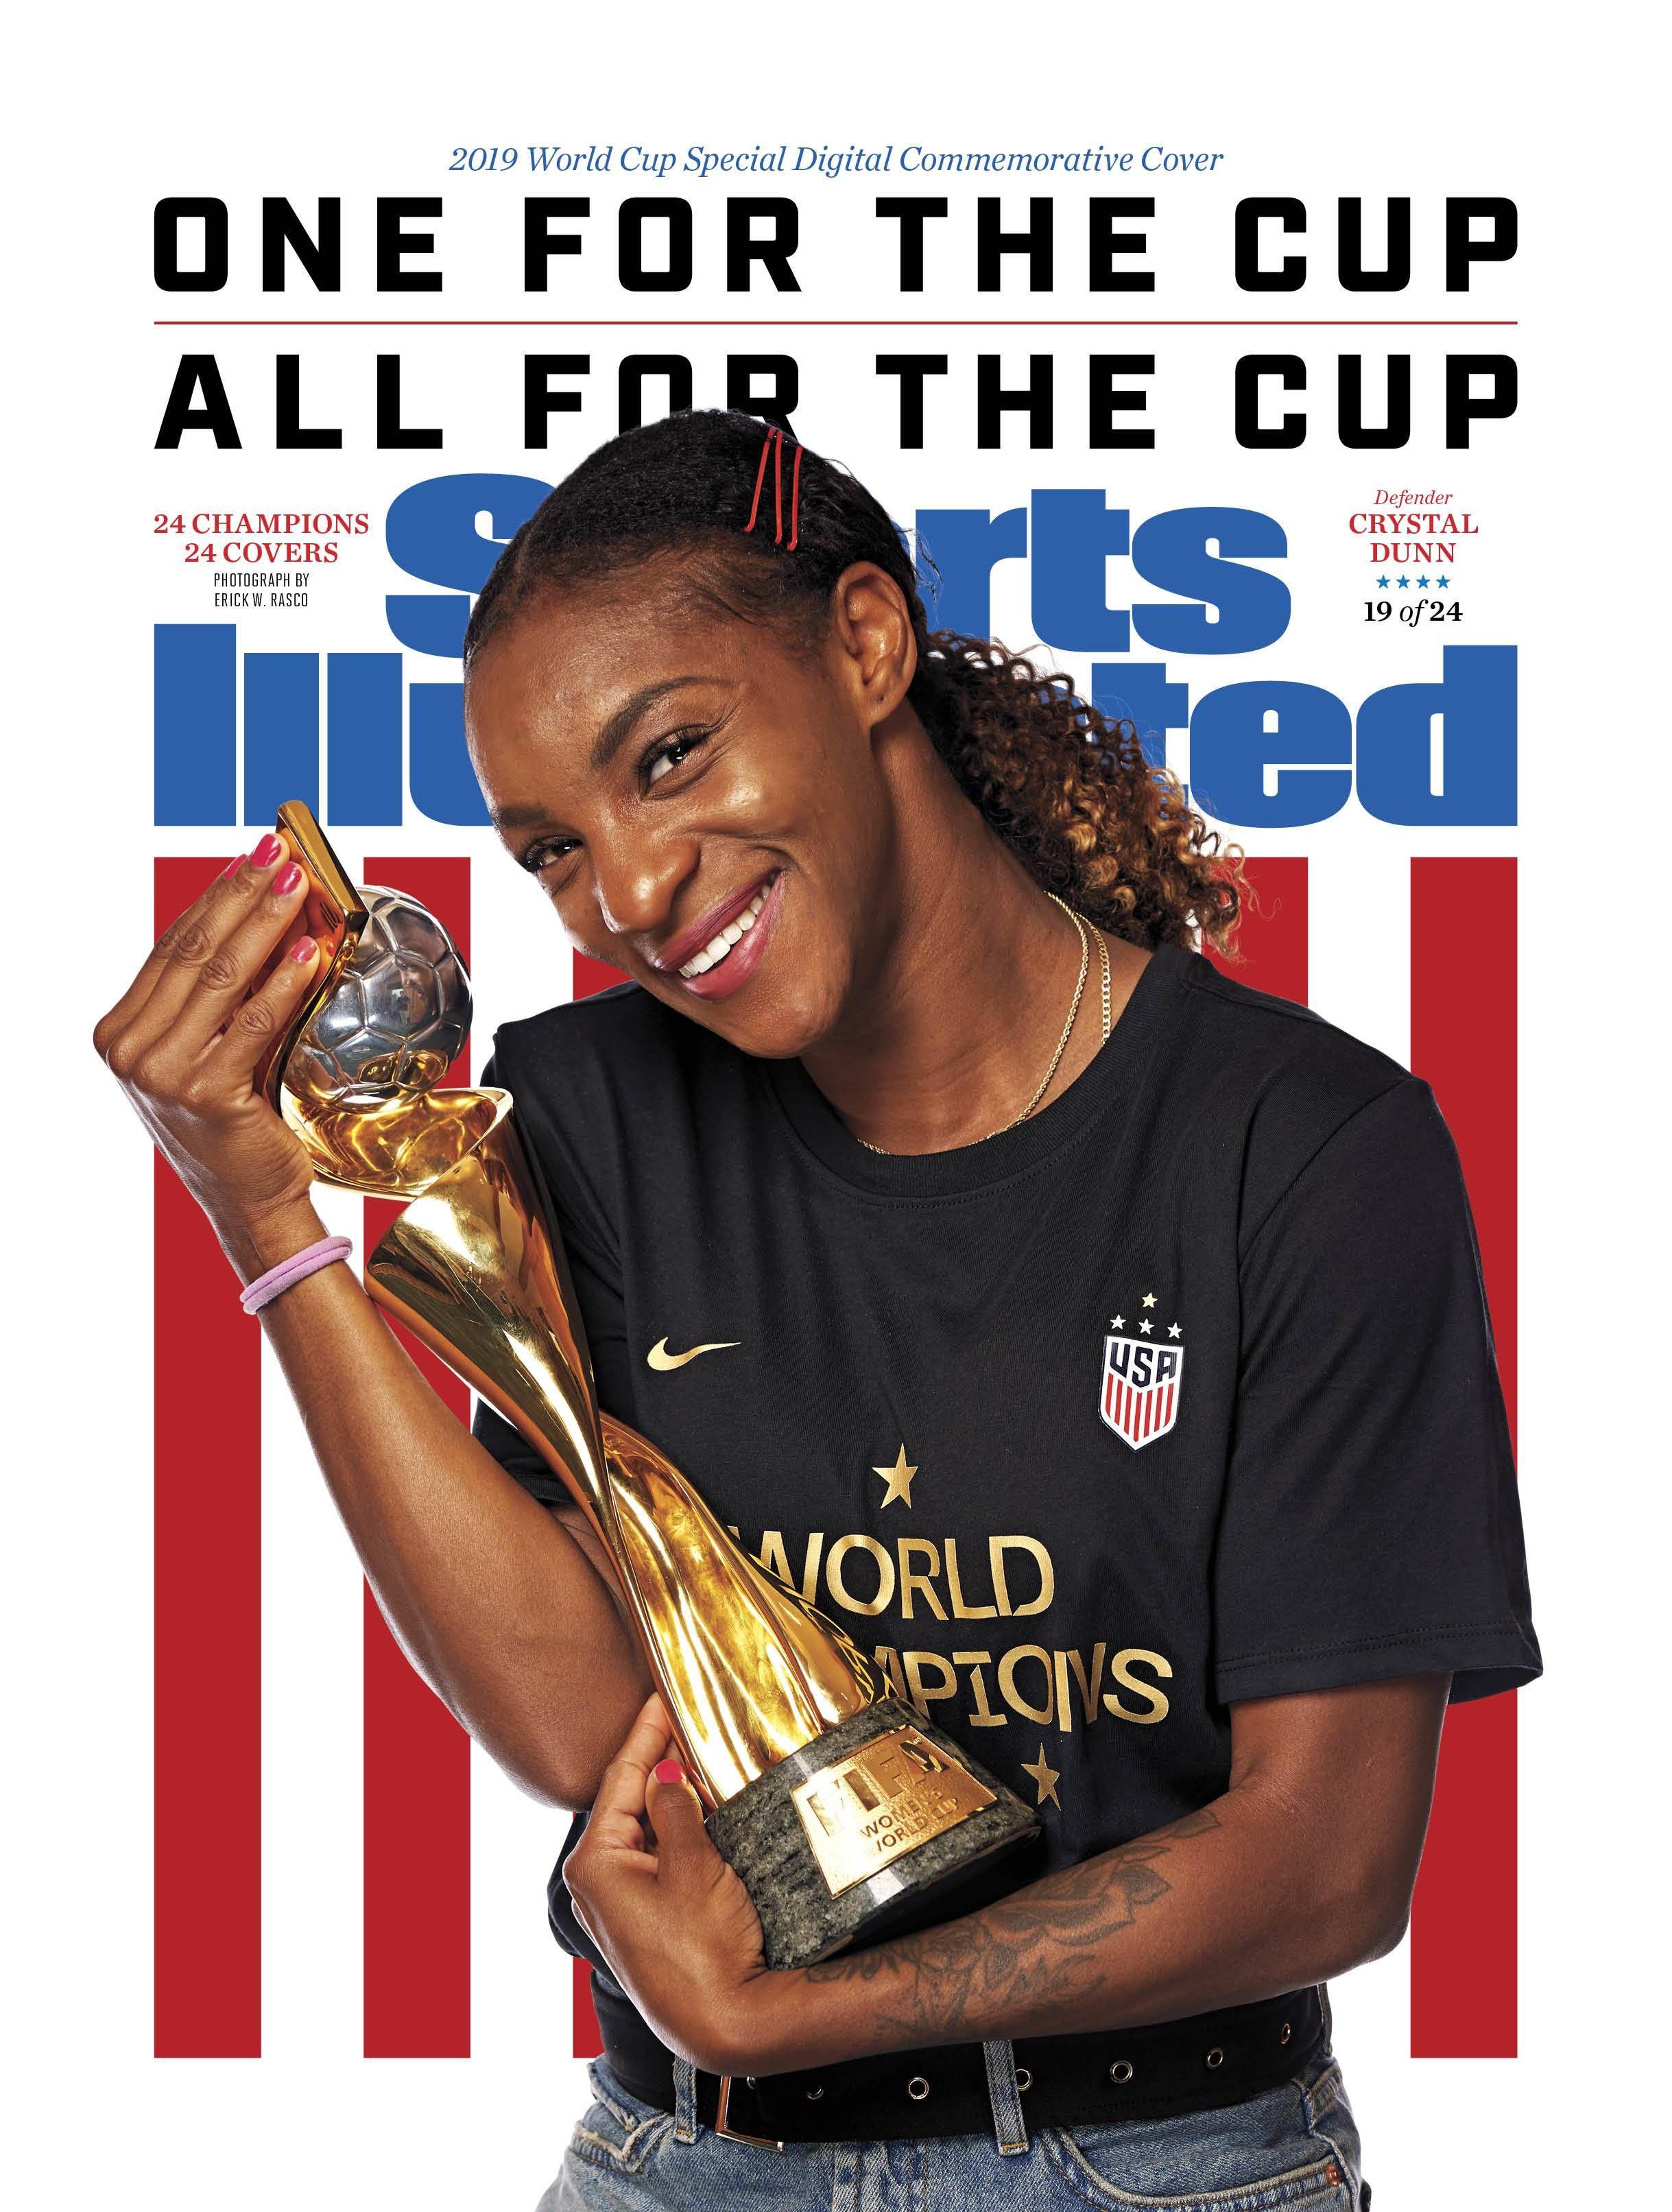 Crystal Dunn 19, Sports Illustrated Commemorative Digital